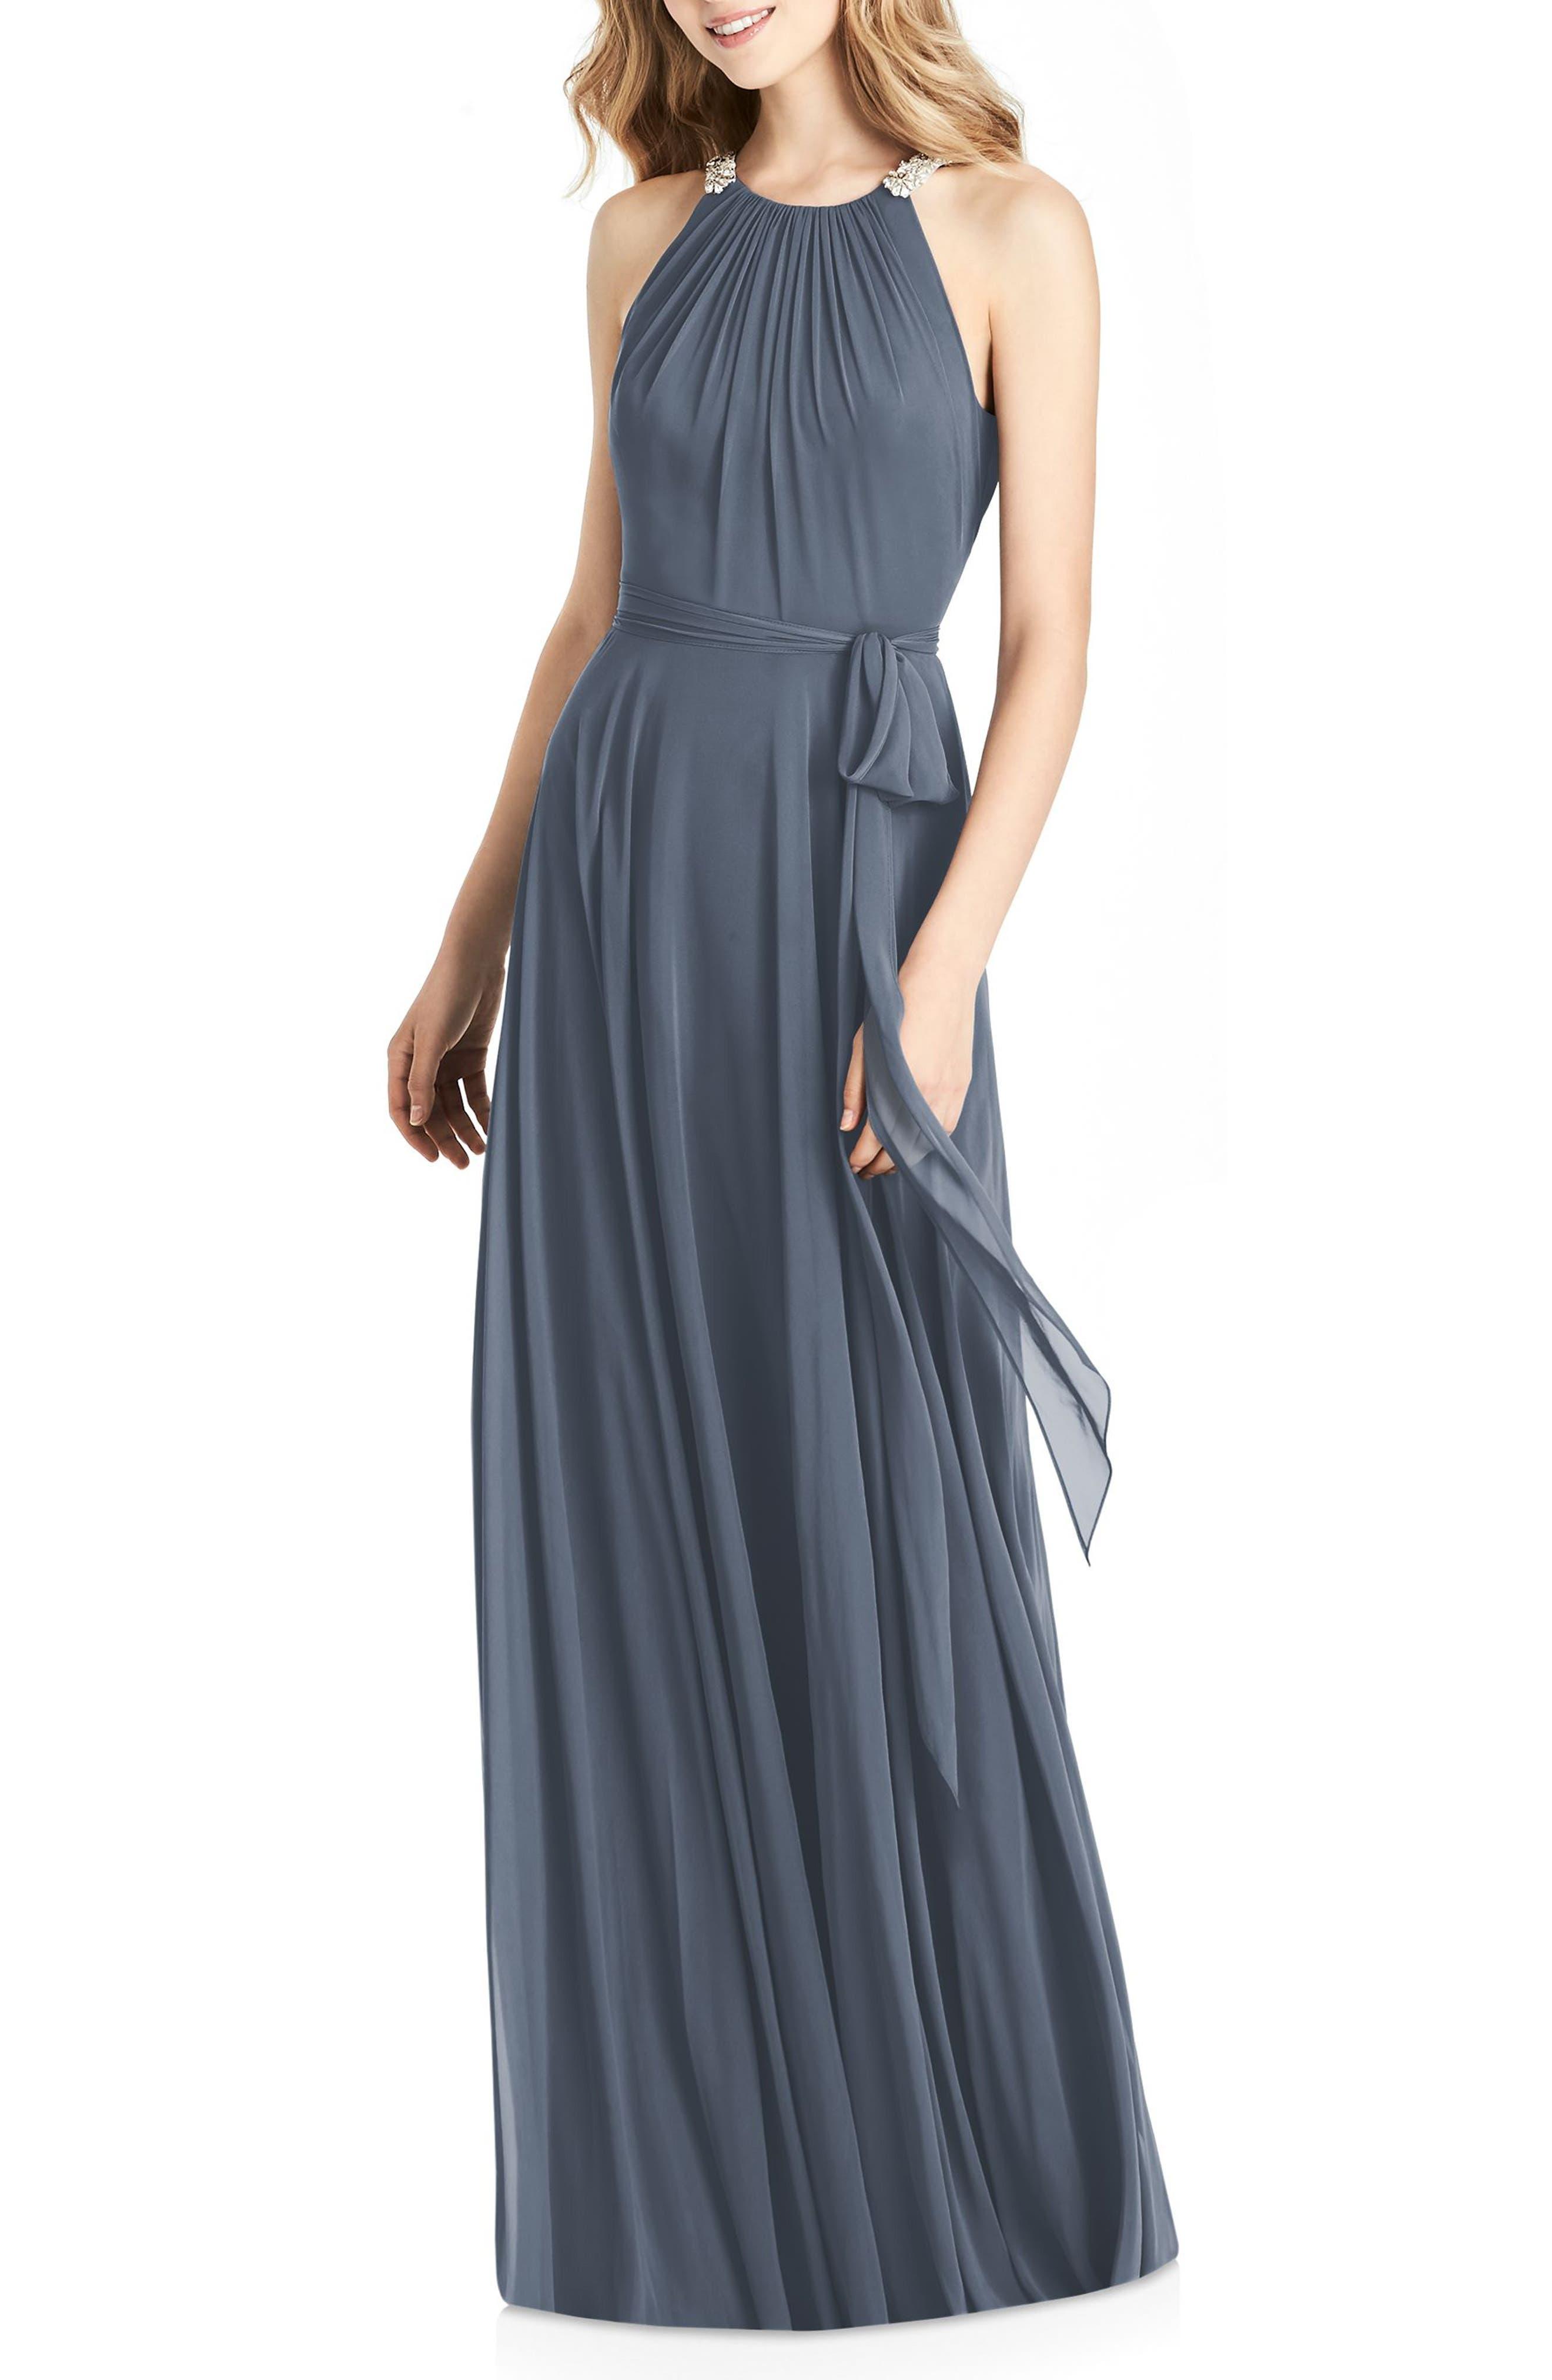 Jenny Packham Beaded Strap Chiffon Gown, Grey